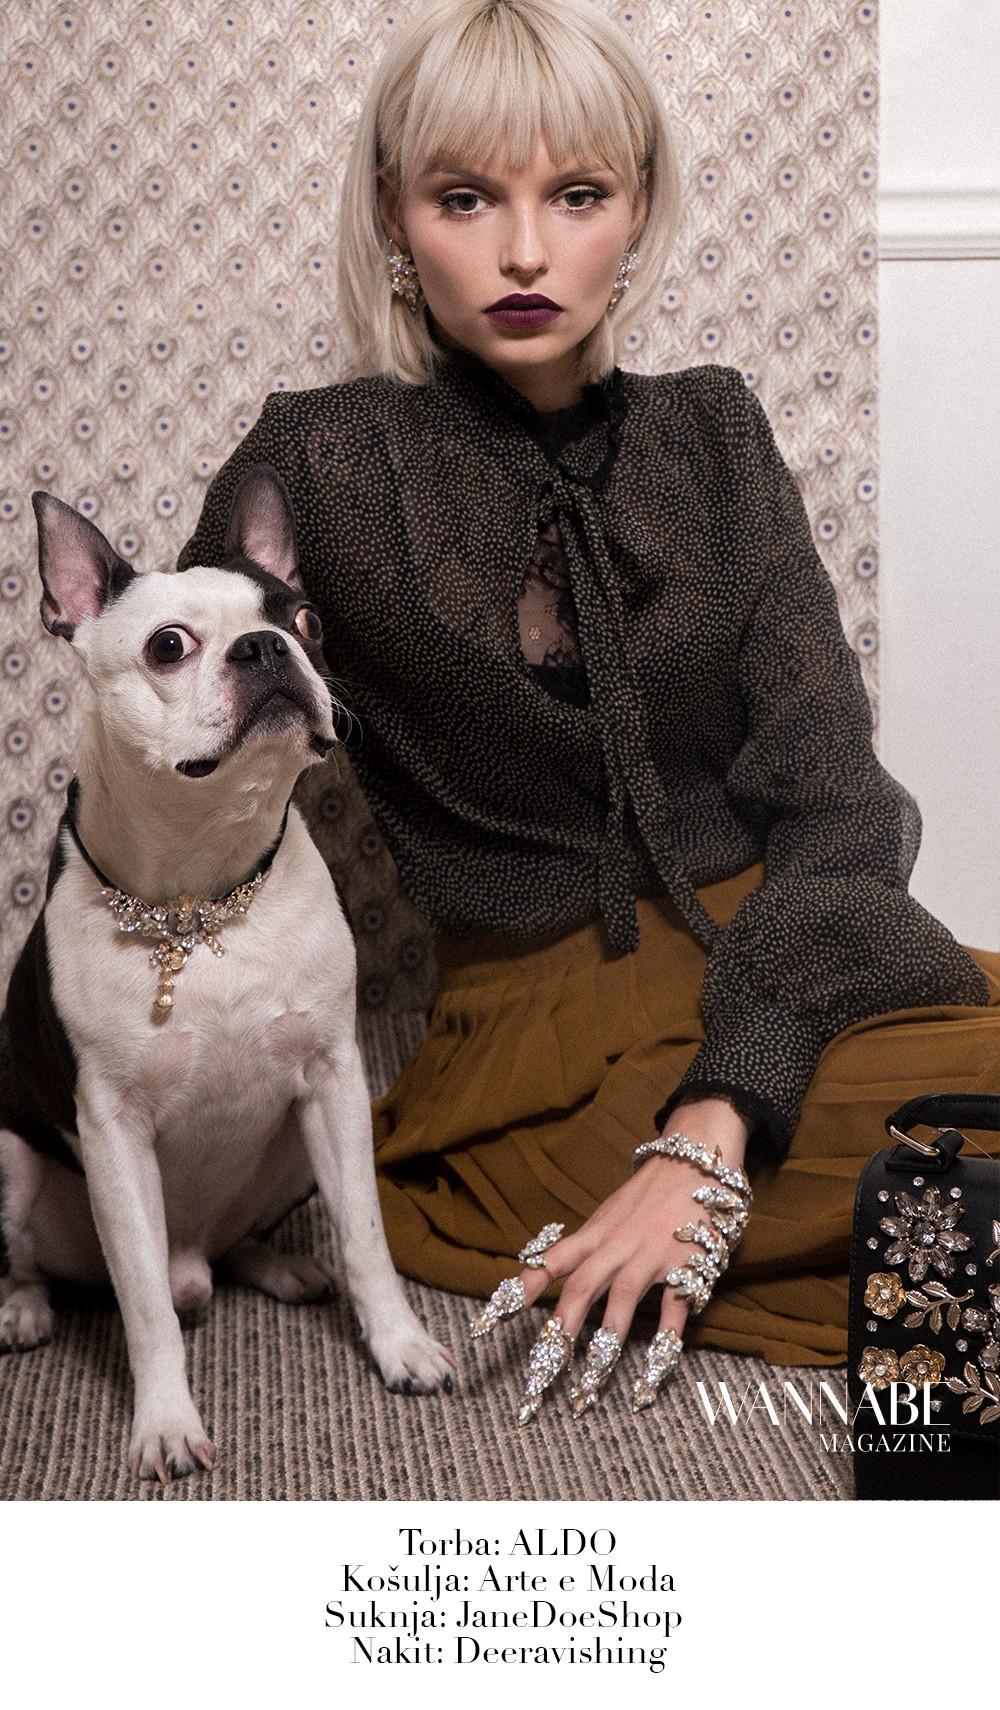 2 Wannabe editorijal: The Portrait of Ladies